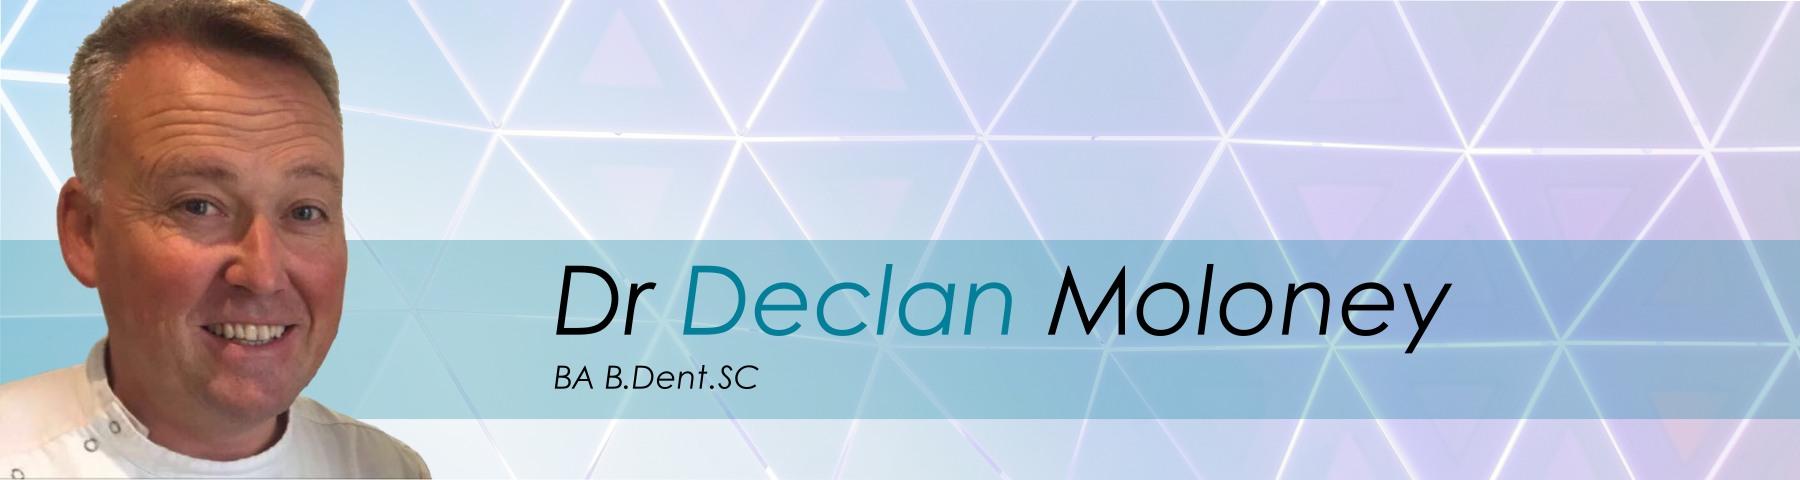 Dr Declan Moloney BA B Dent SC - Dentist Clinic Dublin - fastbraces - botox - face life - anti ageing - profhilo